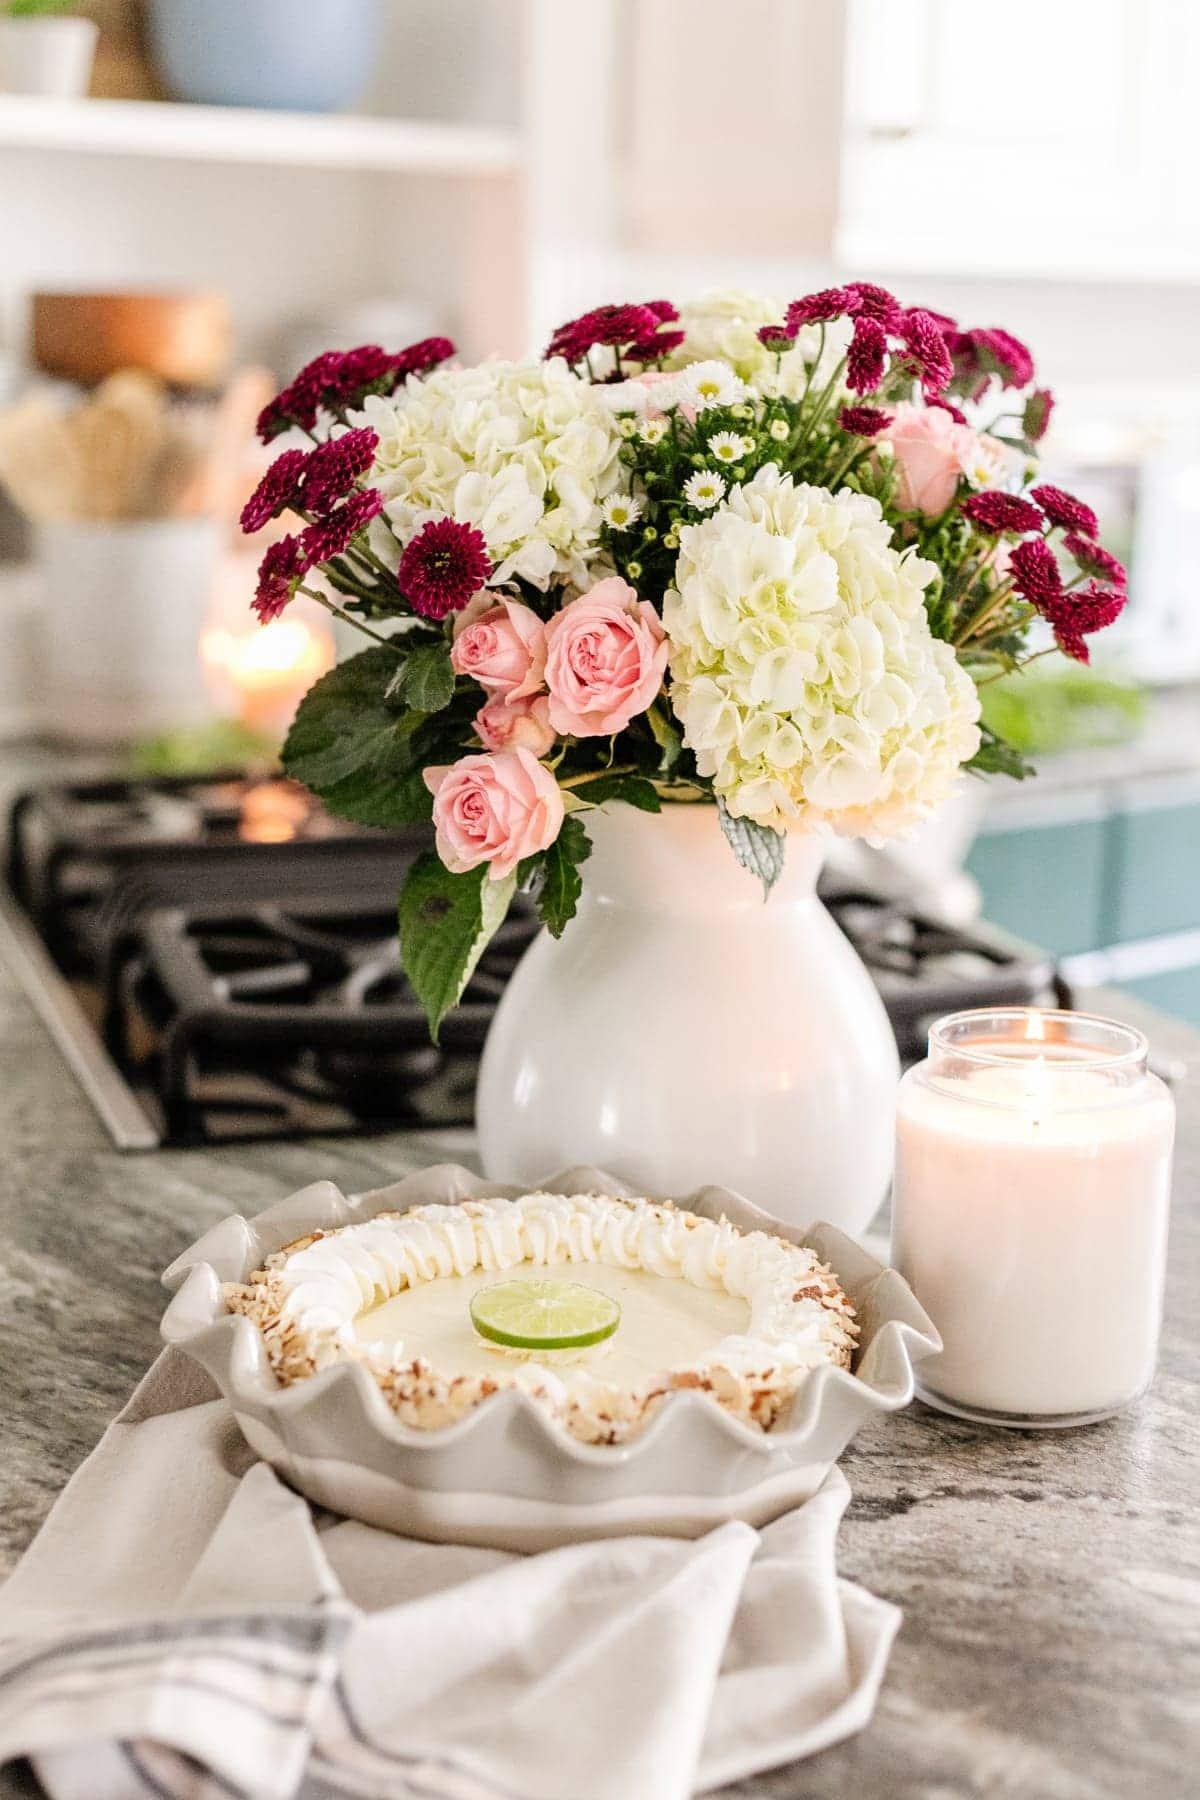 cottagecore style ruffled pie plate